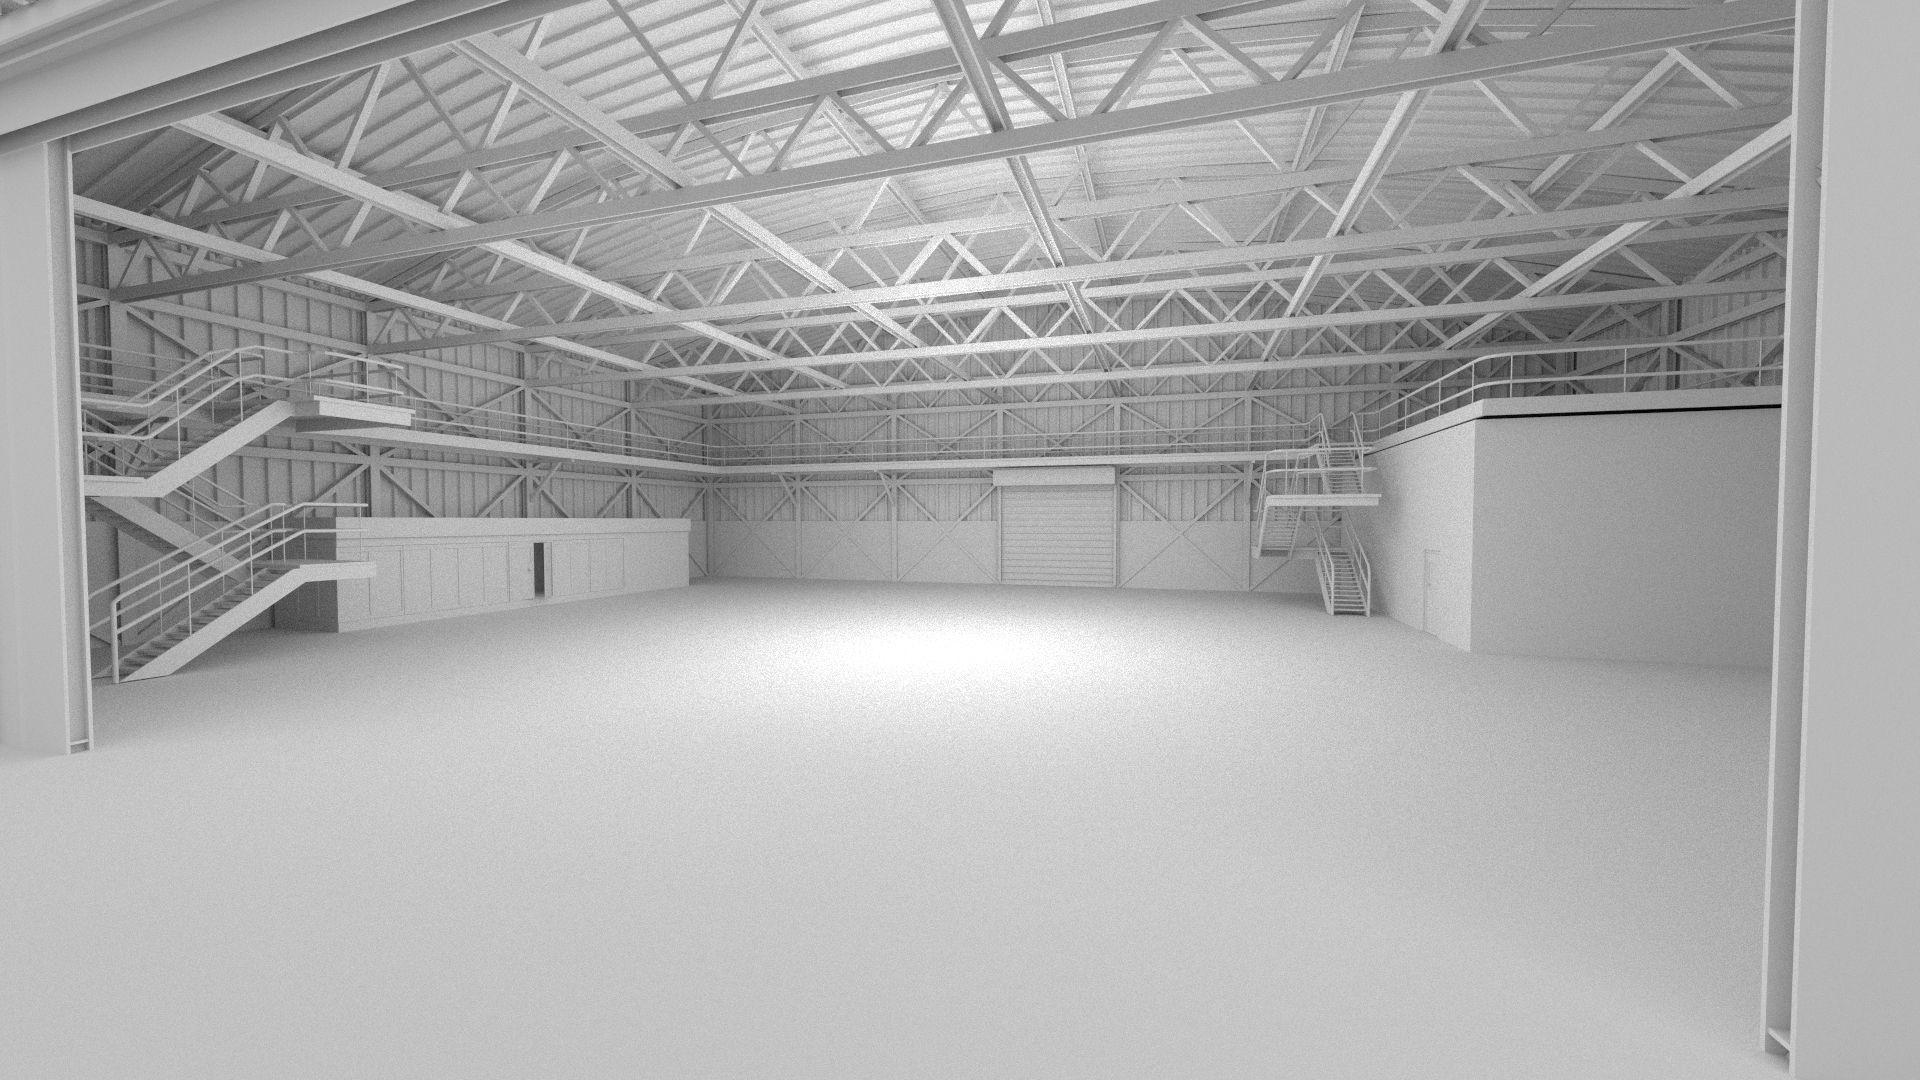 Hangar Scene Free Vr Ar Low Poly 3d Model Obj Fbx